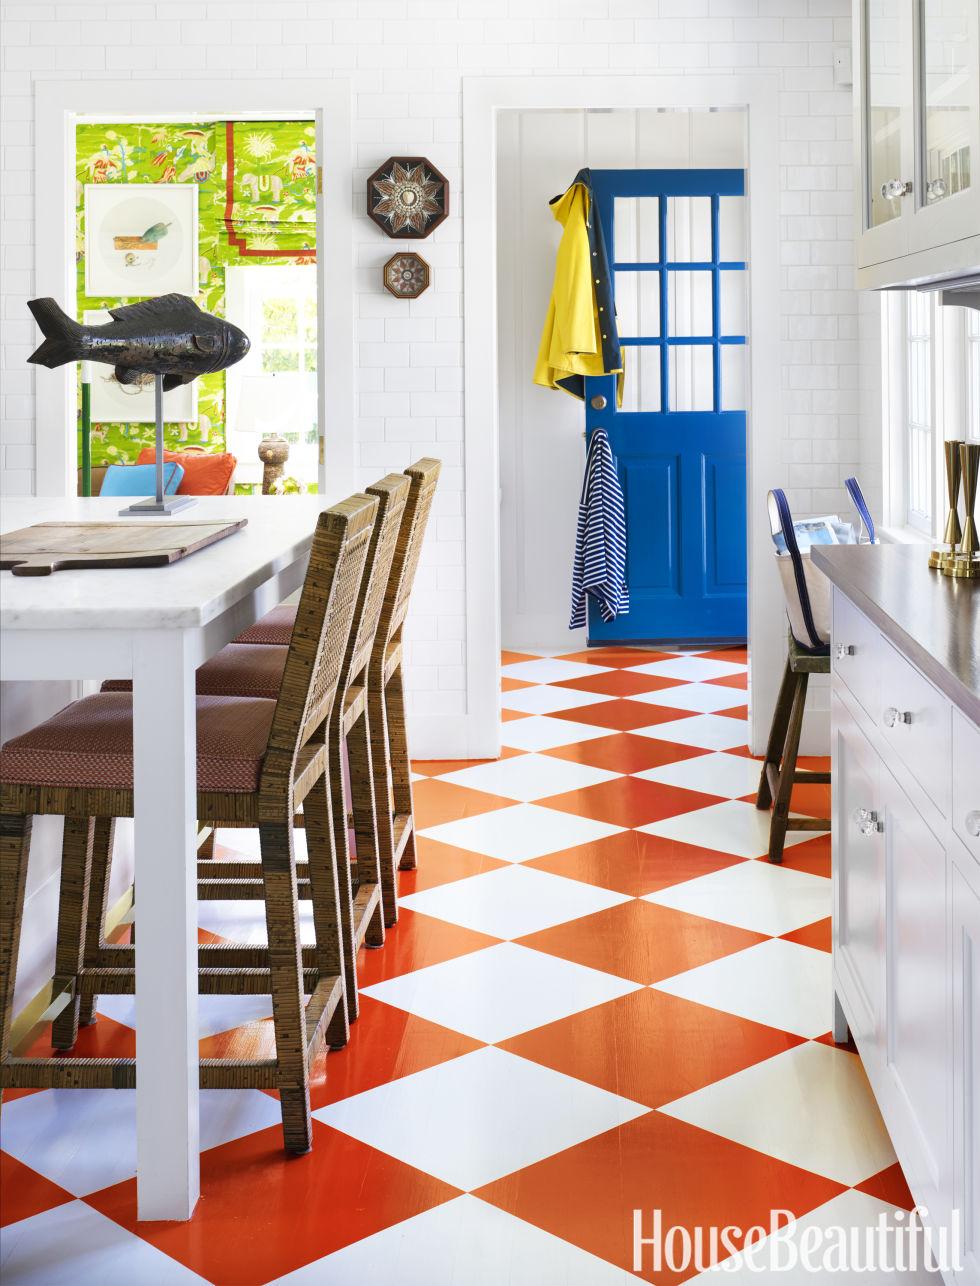 beautiful designer kitchens kitchen & bath remodeling Kitchen Design Remodeling Ideas Pictures of Beautiful Kitchens